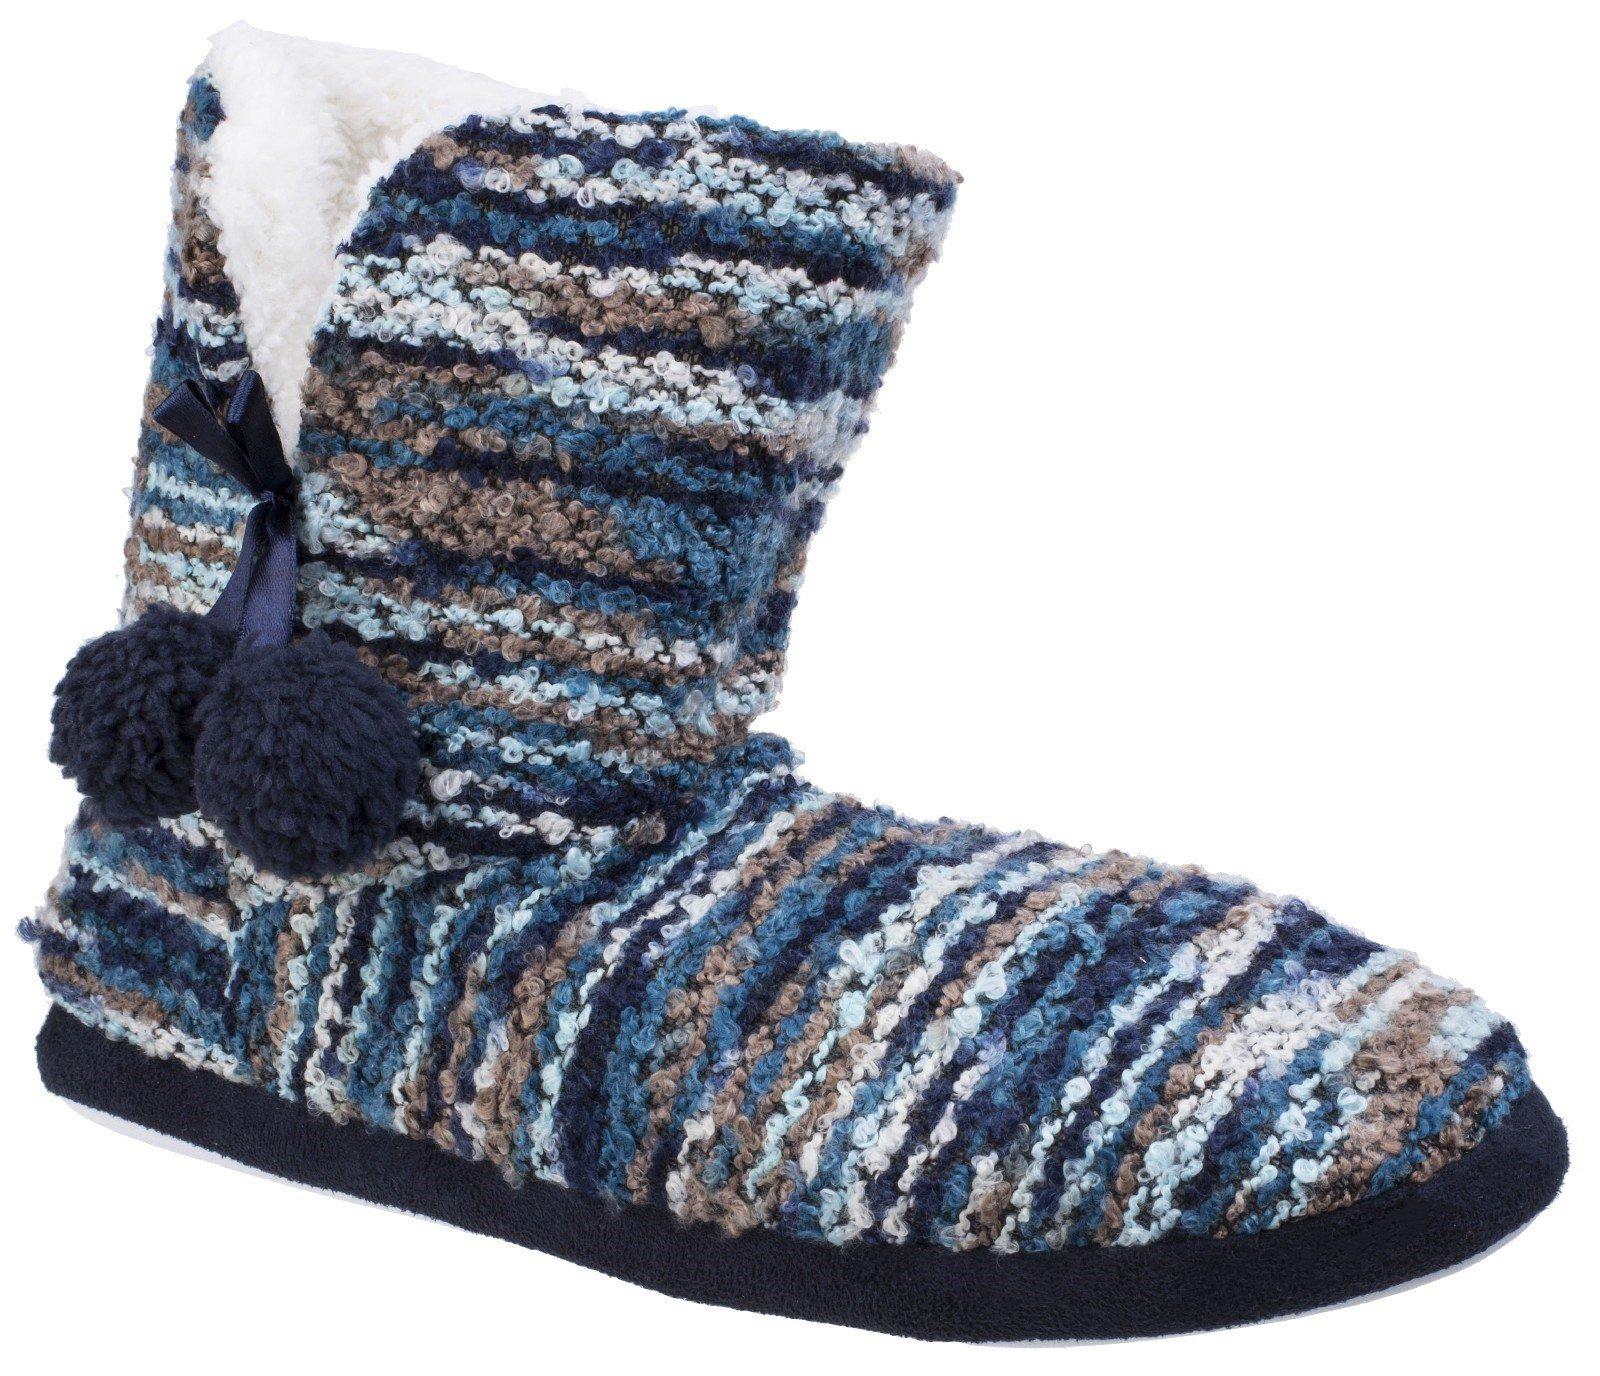 Divaz Women's Vienna Knitted Bootie Slipper Multicolor 25585-42604 - Blue 4